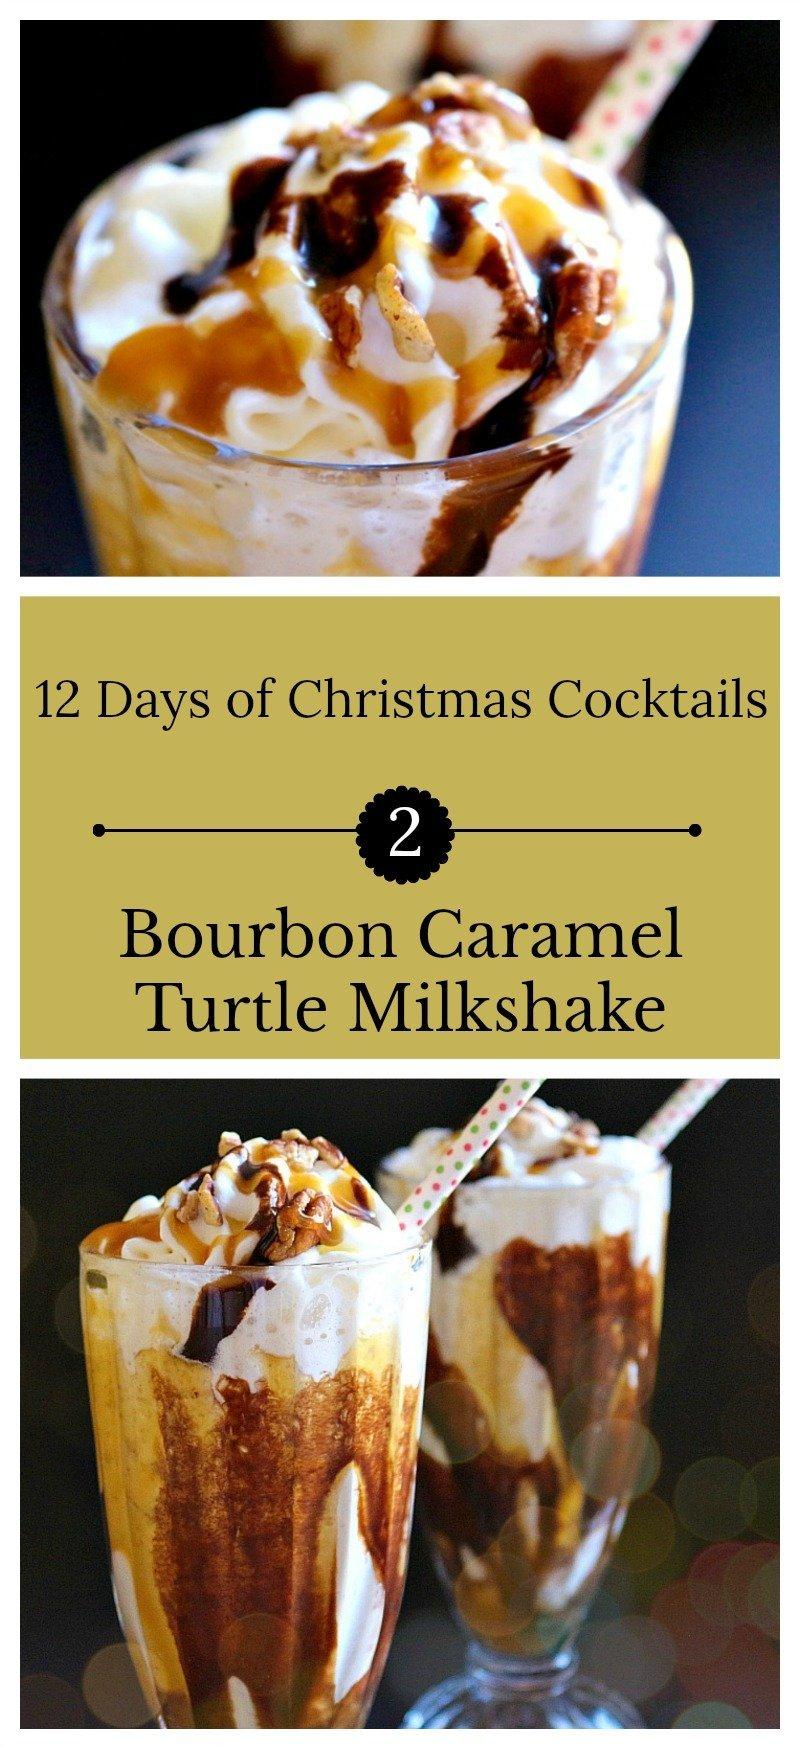 A boozy Bourbon Caramel Turtle Milkshake made with pecan bourbon, butter pecan ice cream, and a blend of liqueurs.